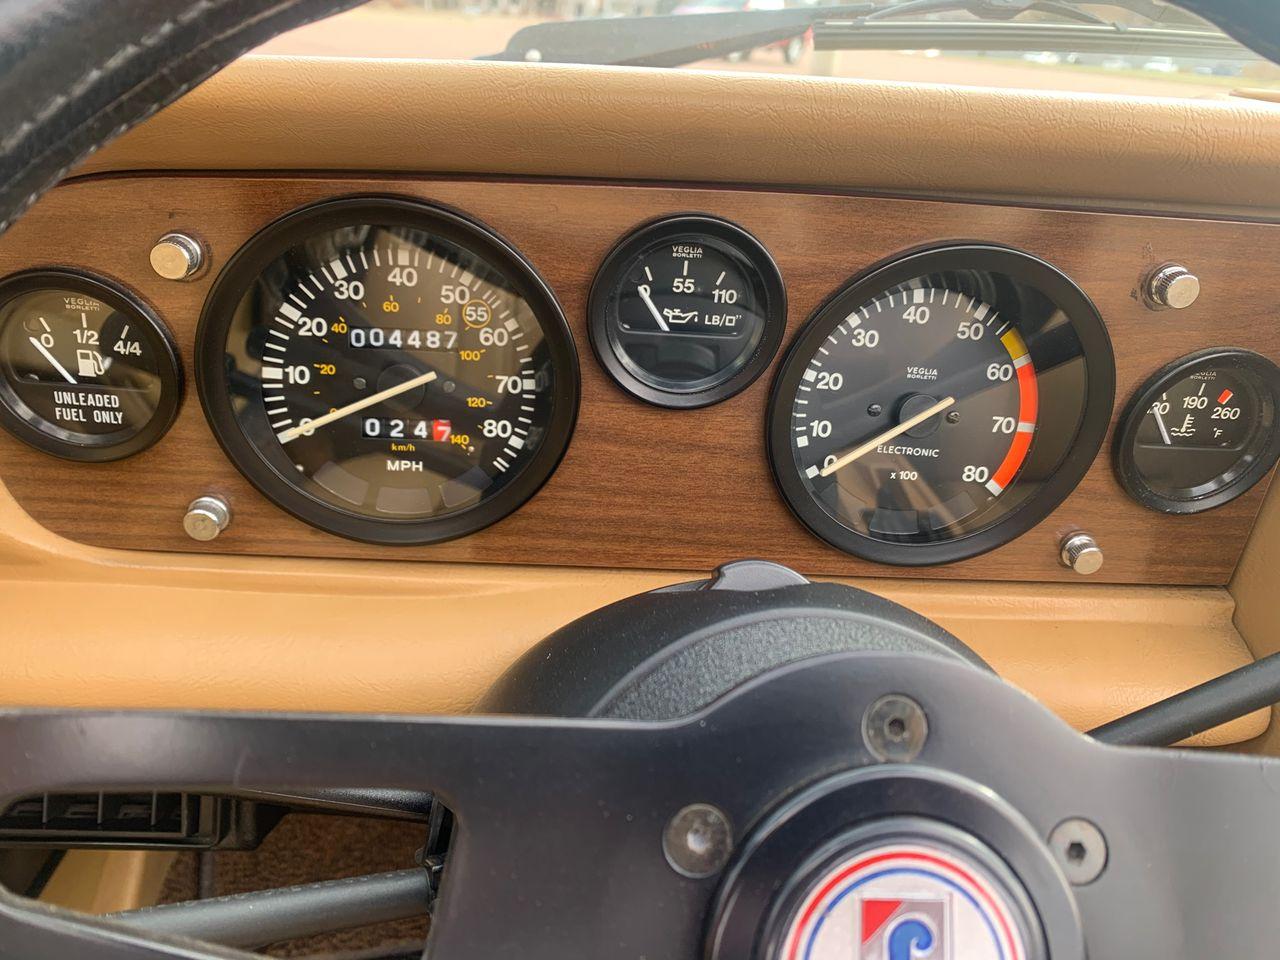 1984 Pininfarina Azzurra Spider 2000   Sioux Falls, SD, Red & Orange, Rear Wheel